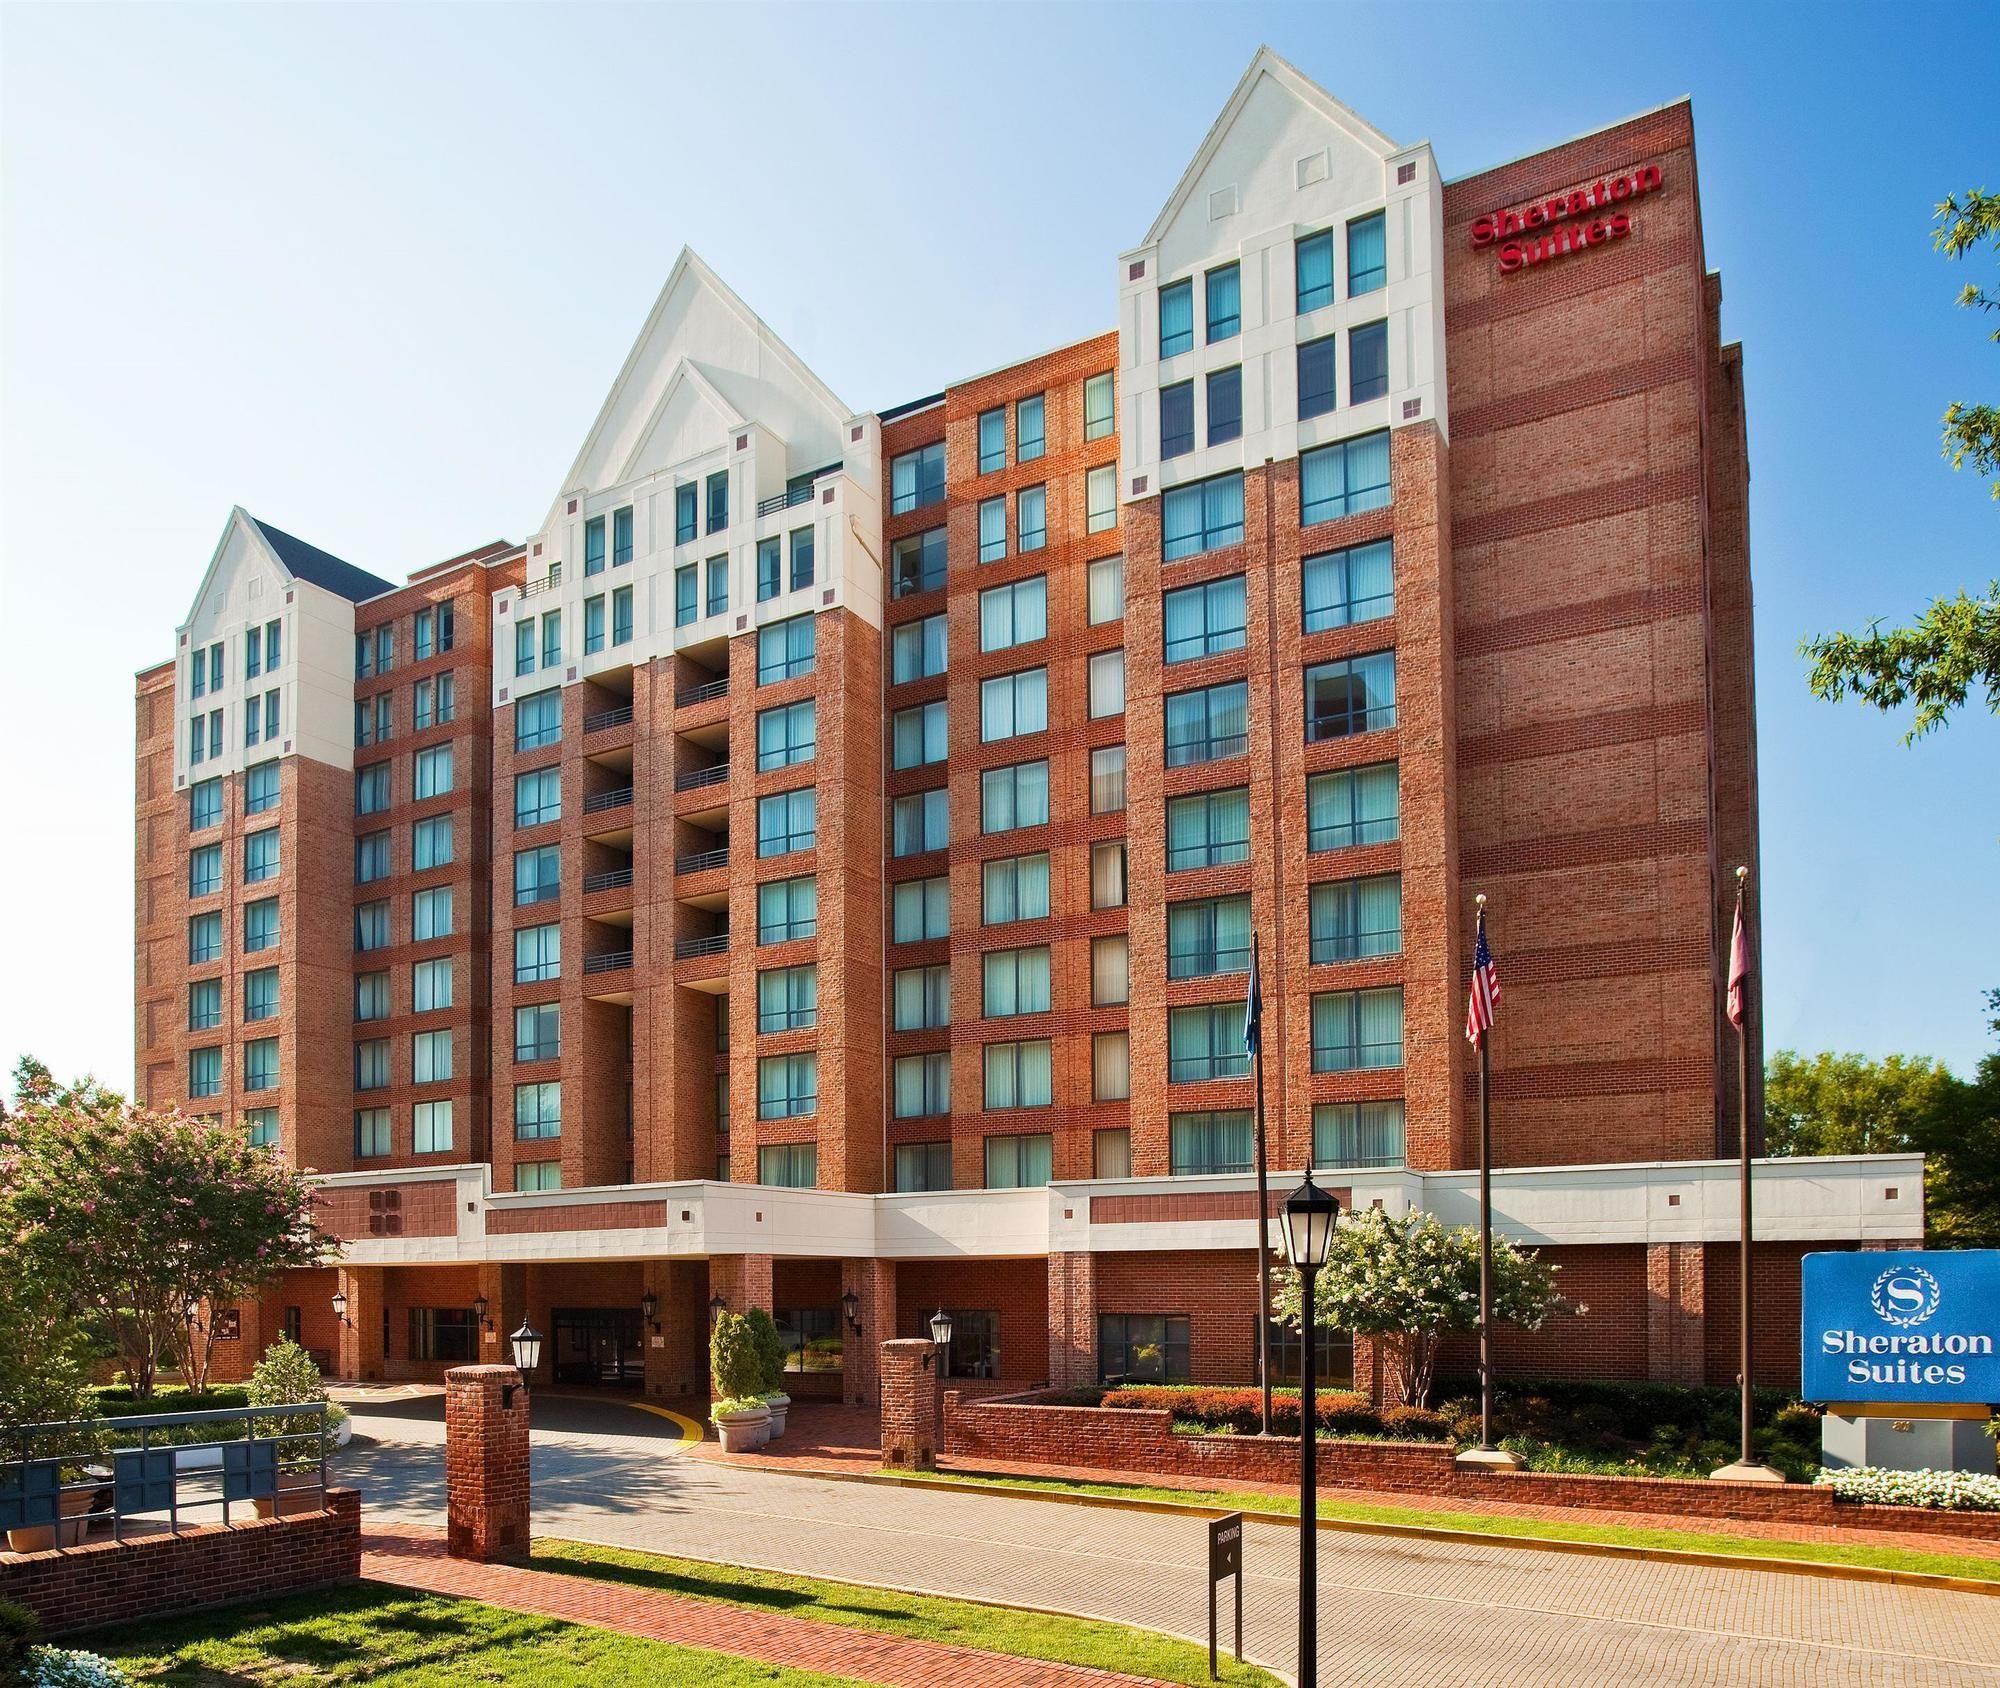 Alexandria Hotel Coupons for Alexandria, Virginia - FreeHotelCoupons.com